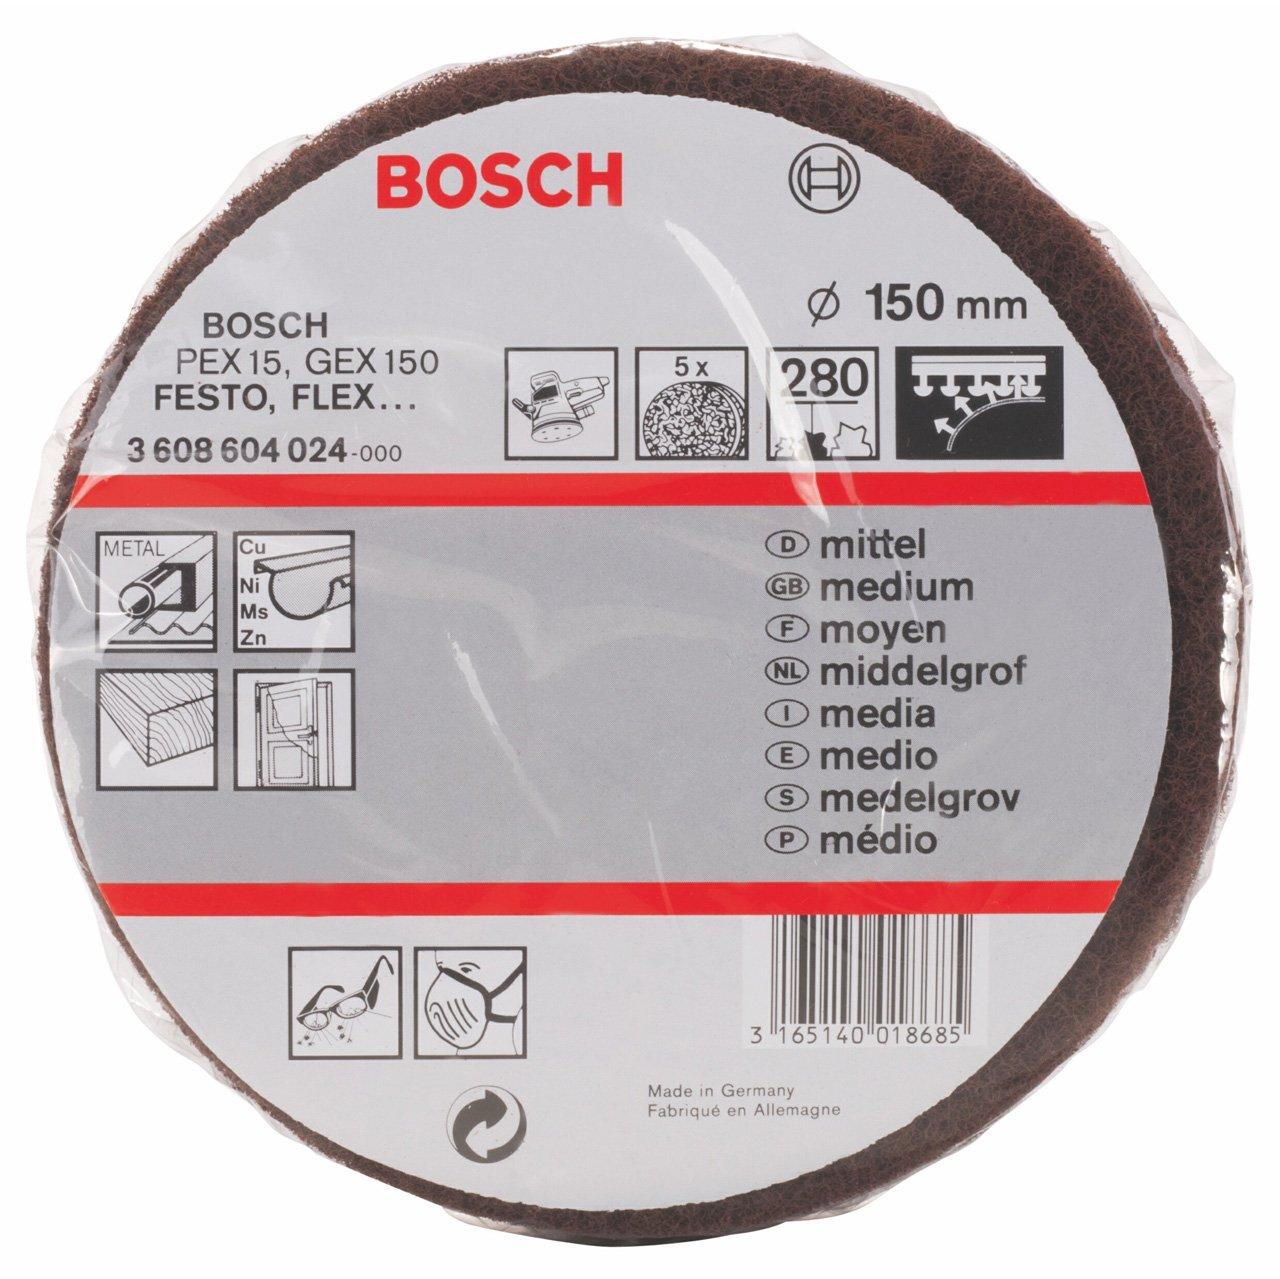 Bosch 3 608 604 024 Disque é ponge abrasif Diamè tre 150 mm / Grain 280 Bosch Professional 3608604024